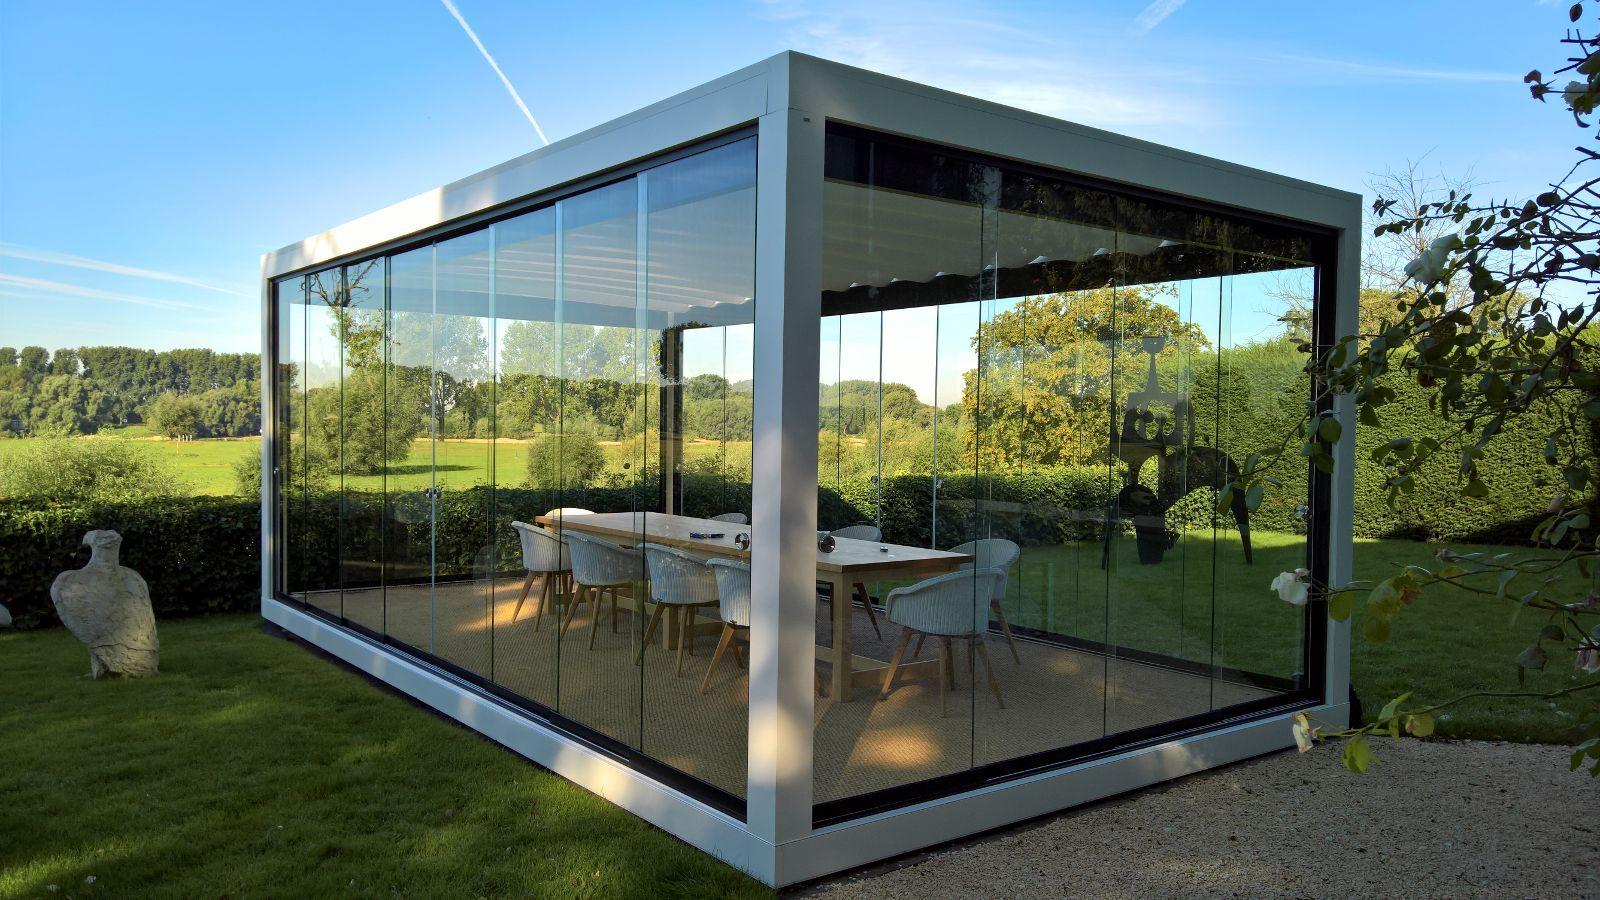 Pergola Metall Freistehend ~ Terrassenüberdachung melano freistehend glashaus pergola garten